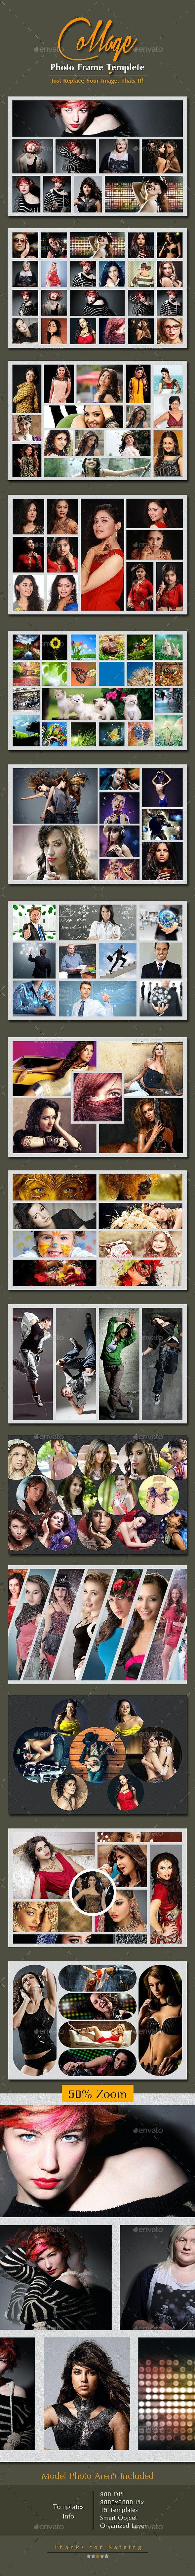 College Photo Frame Templete - Photo Templates Graphics